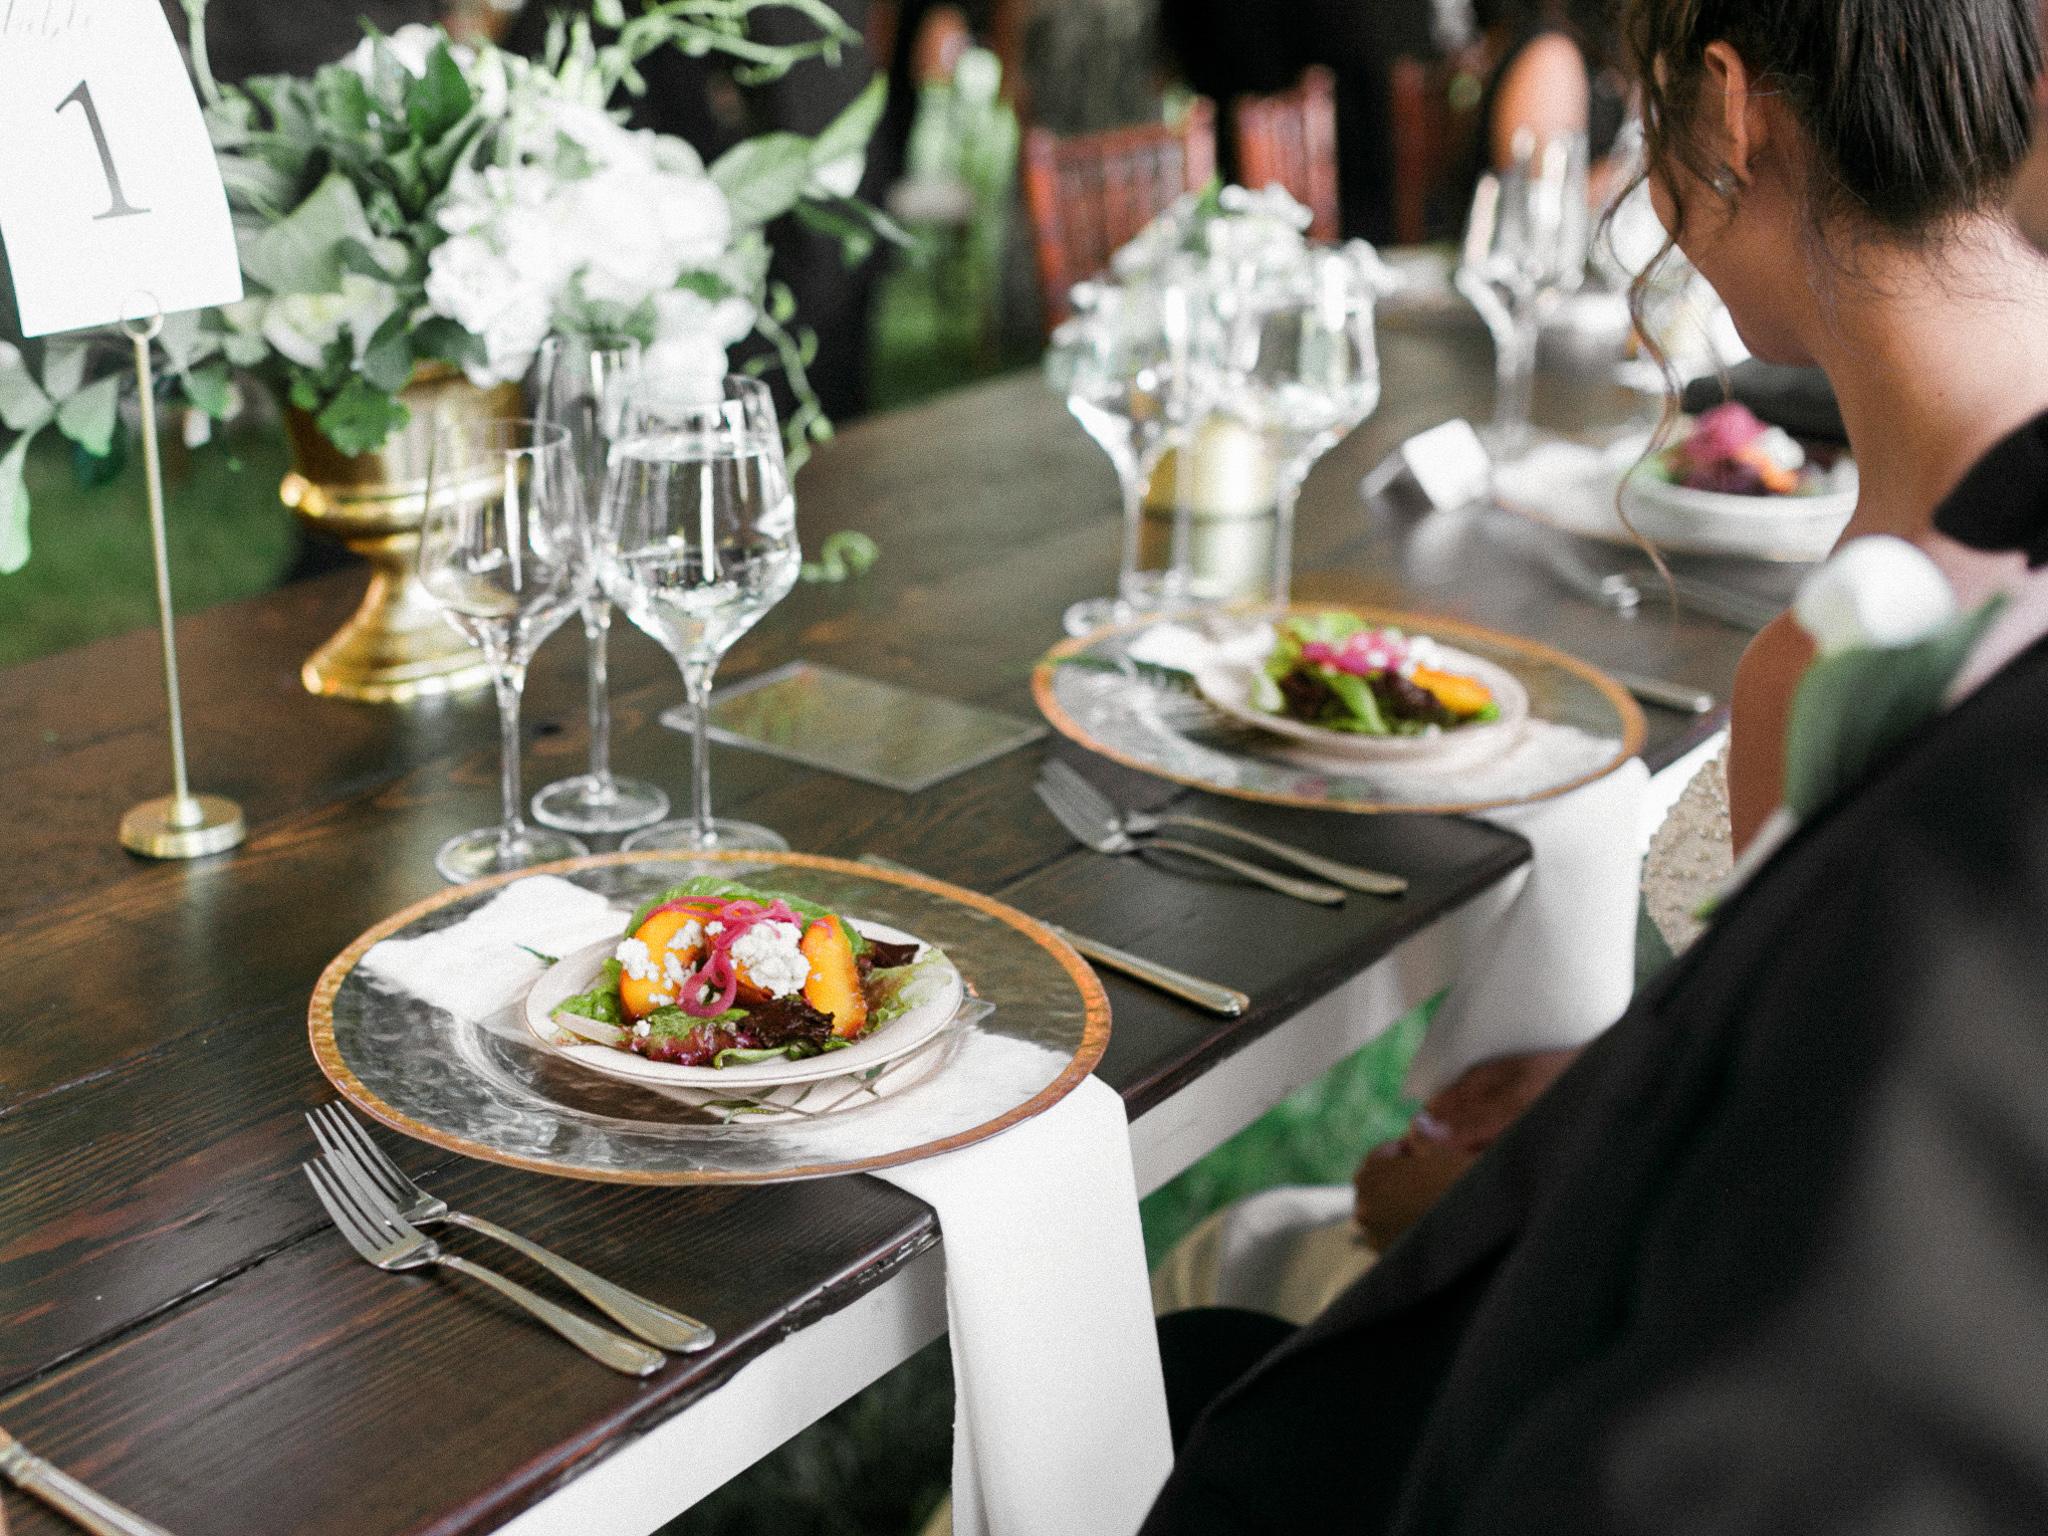 179OutliveCreative_Travel_Photographer_Videographer_Lewis&Clark_Oregon_Elegant_BlackTie_Destination_Wedding.jpg